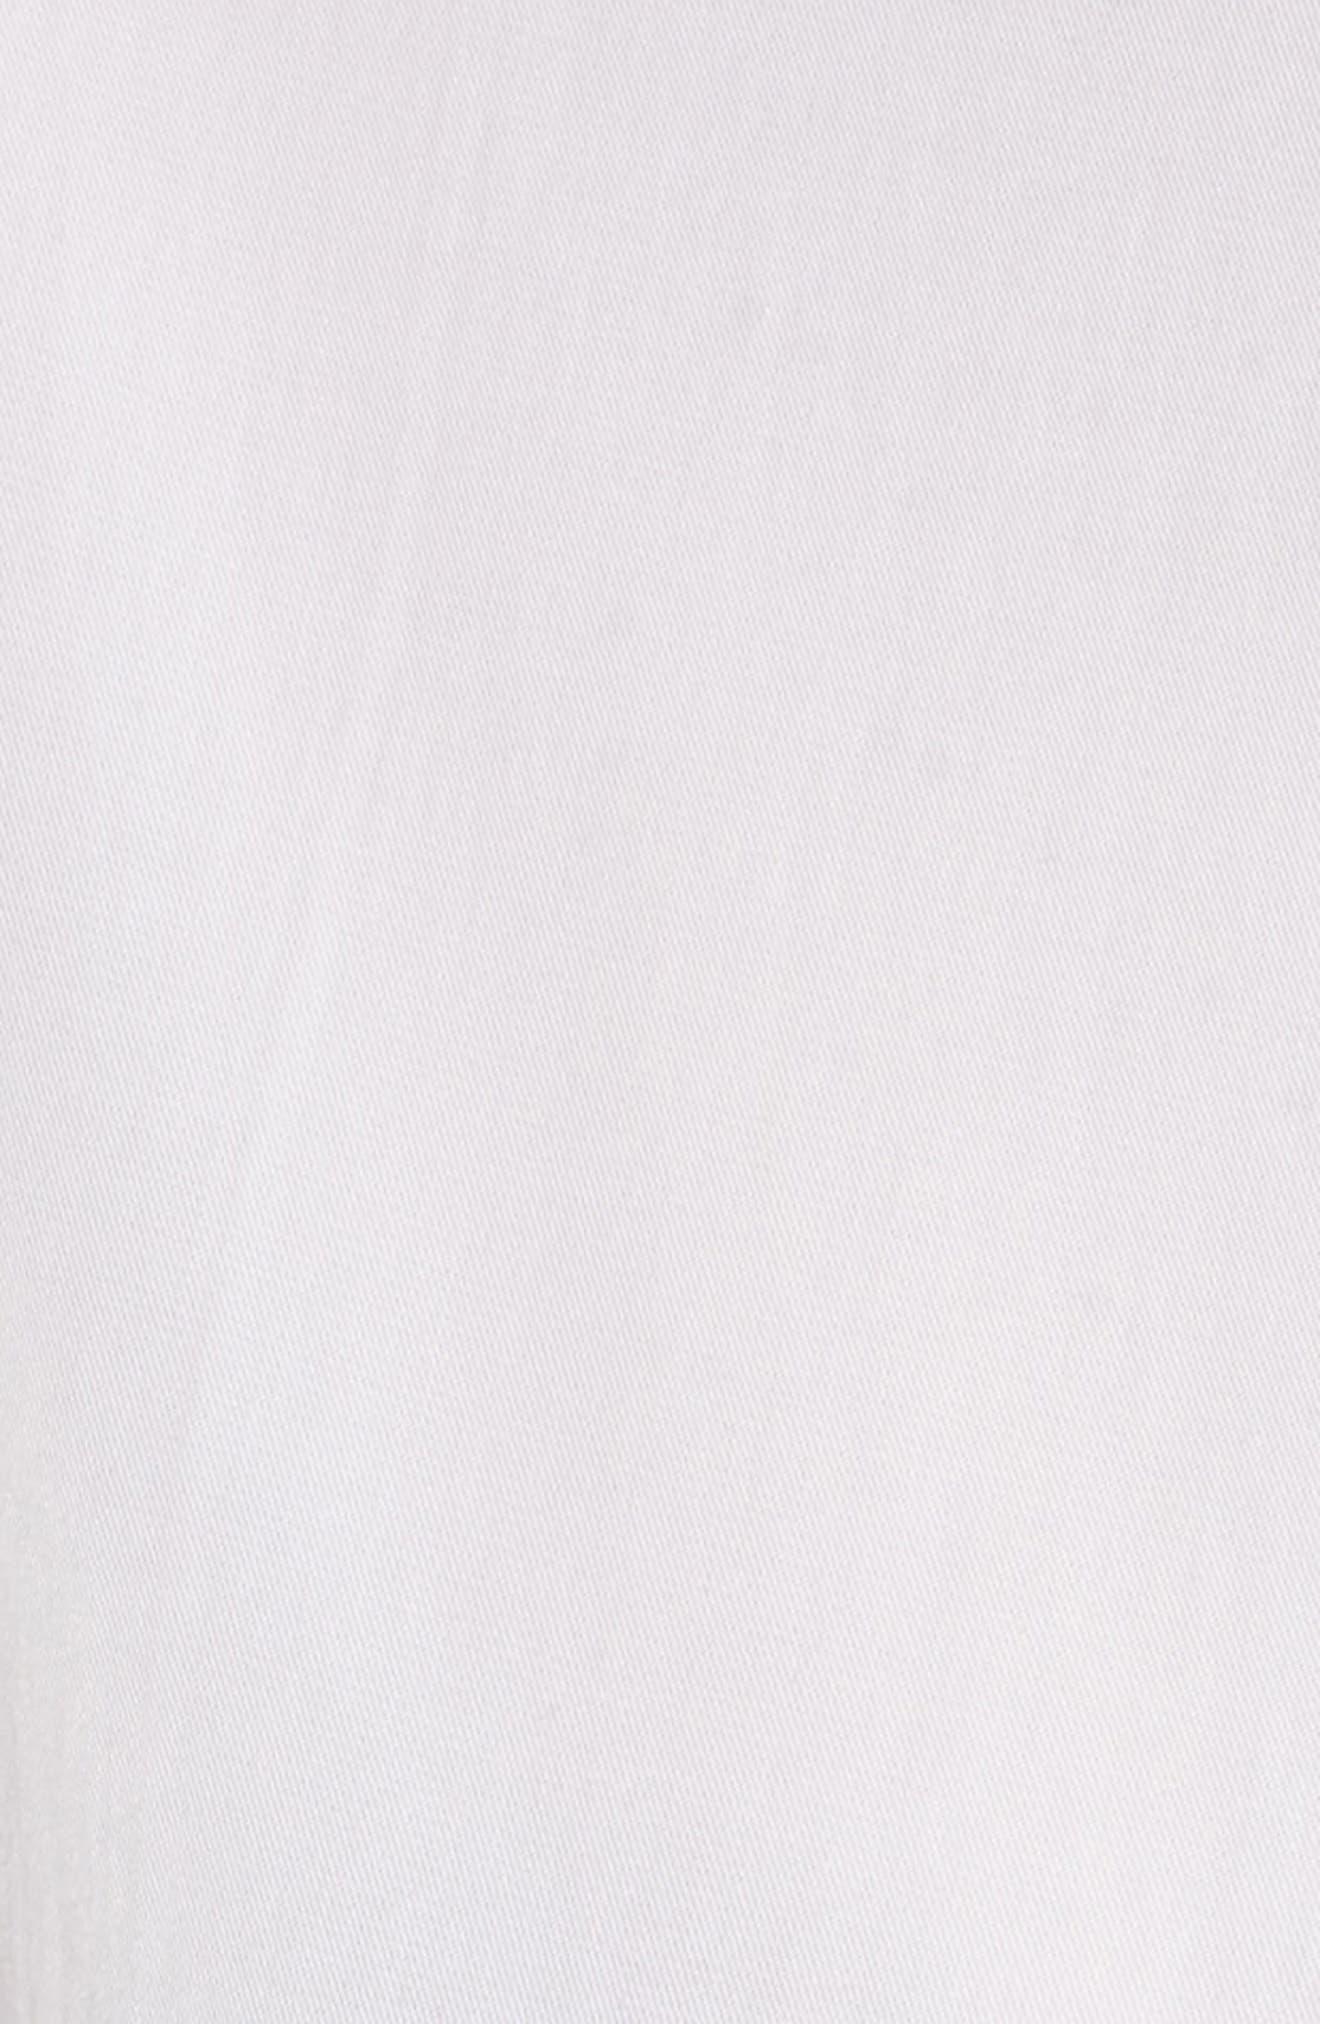 Montauk Shirt,                             Alternate thumbnail 5, color,                             100